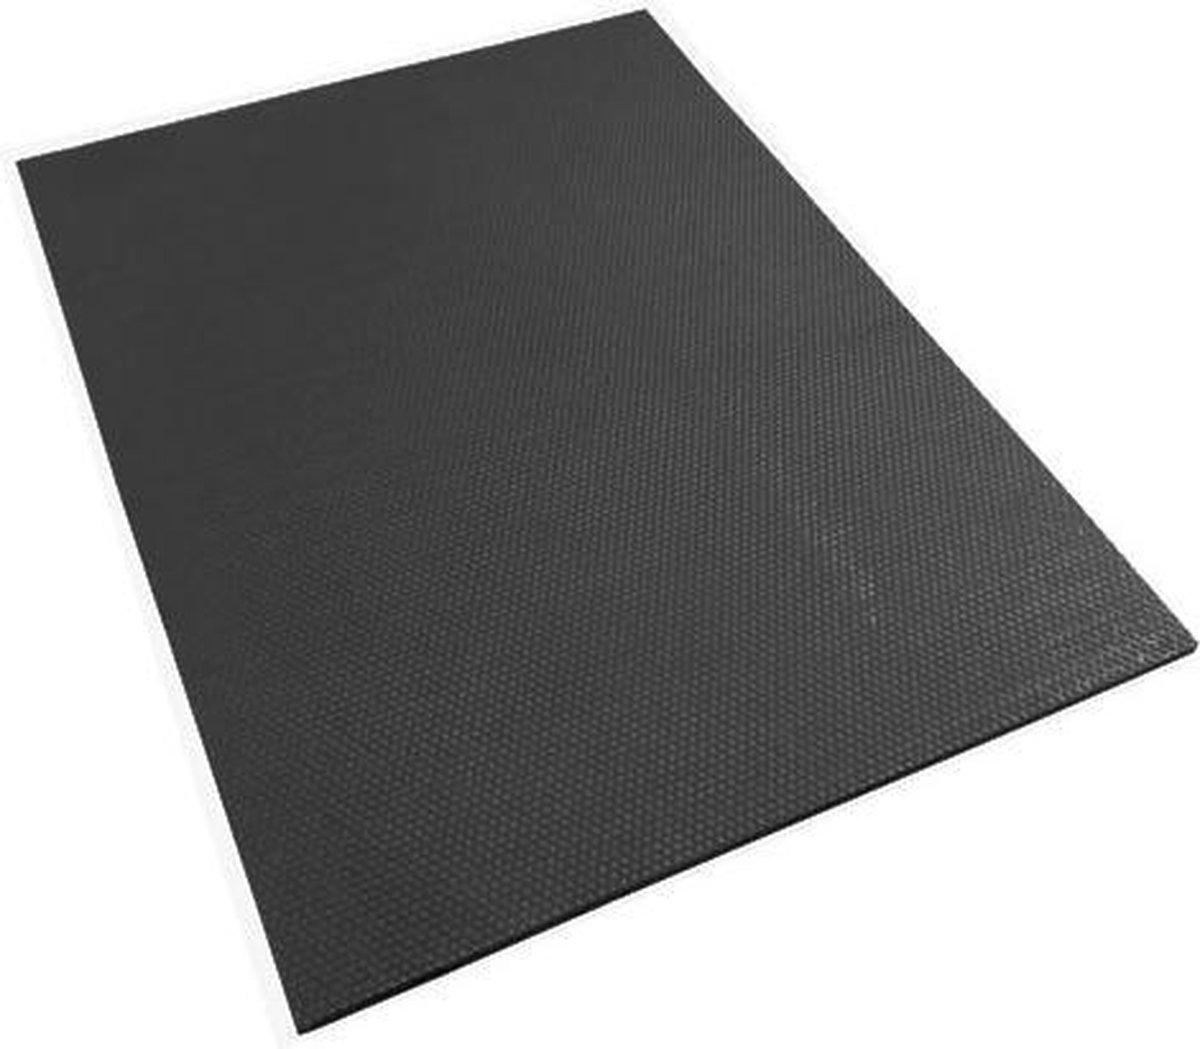 Stalmat 90 x 120 cm - 17 mm